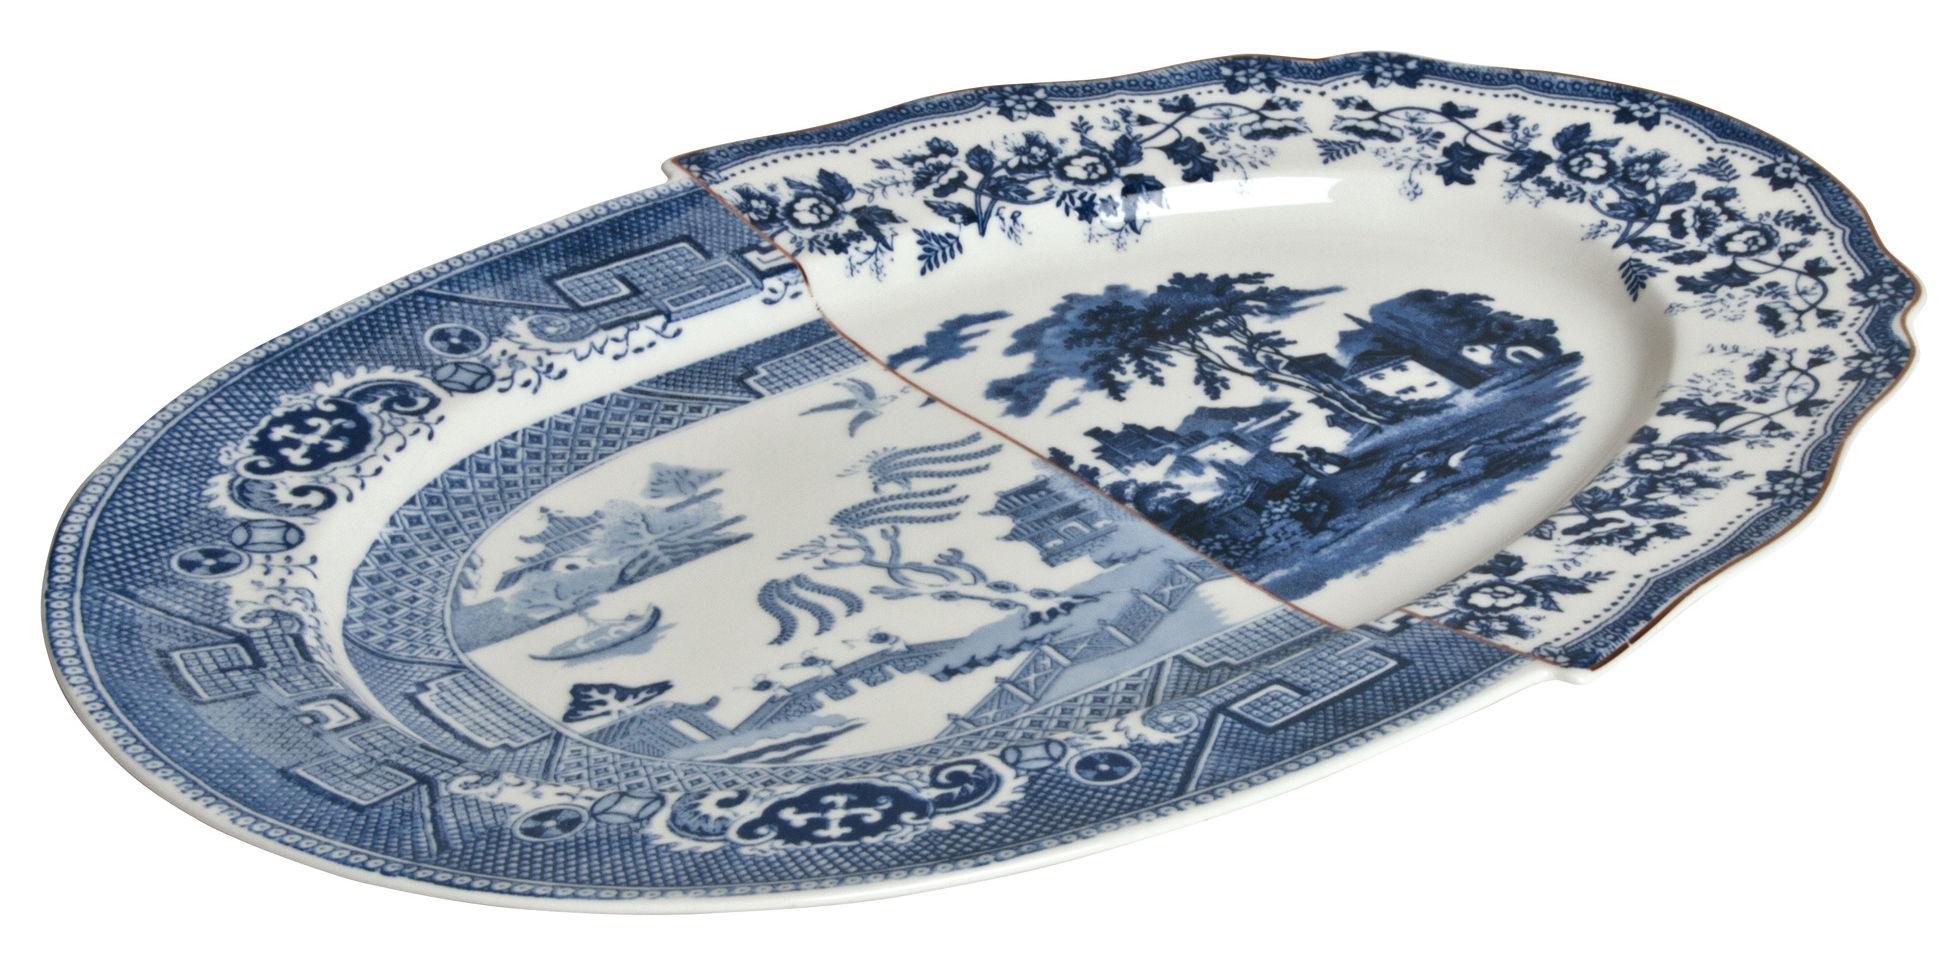 Tableware - Serving Plates - Hybrid Diomira Dish by Seletti - Diomira / Blue - Bone china